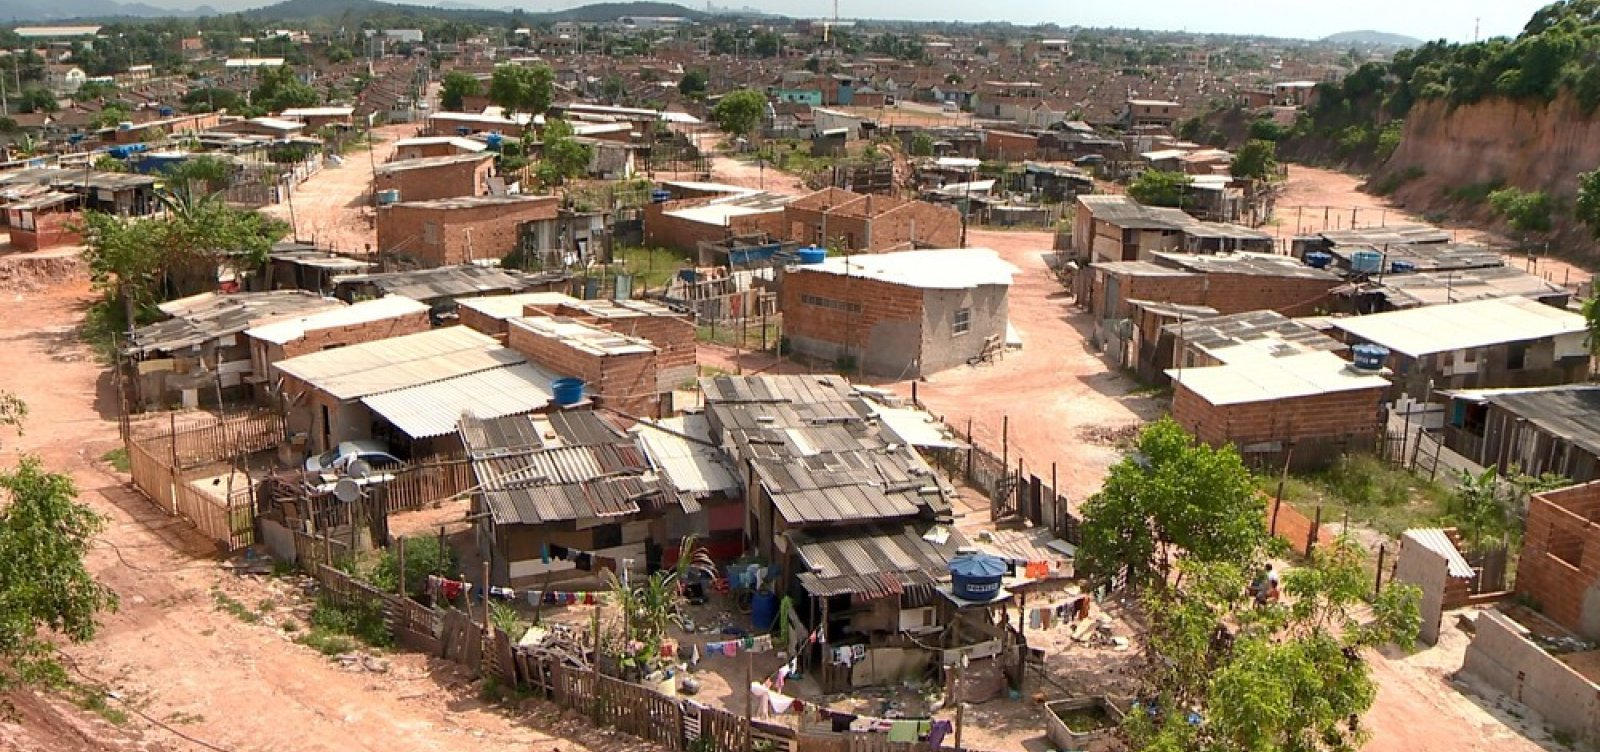 Pobreza aumenta no Brasil, diz relatório do Banco Mundial